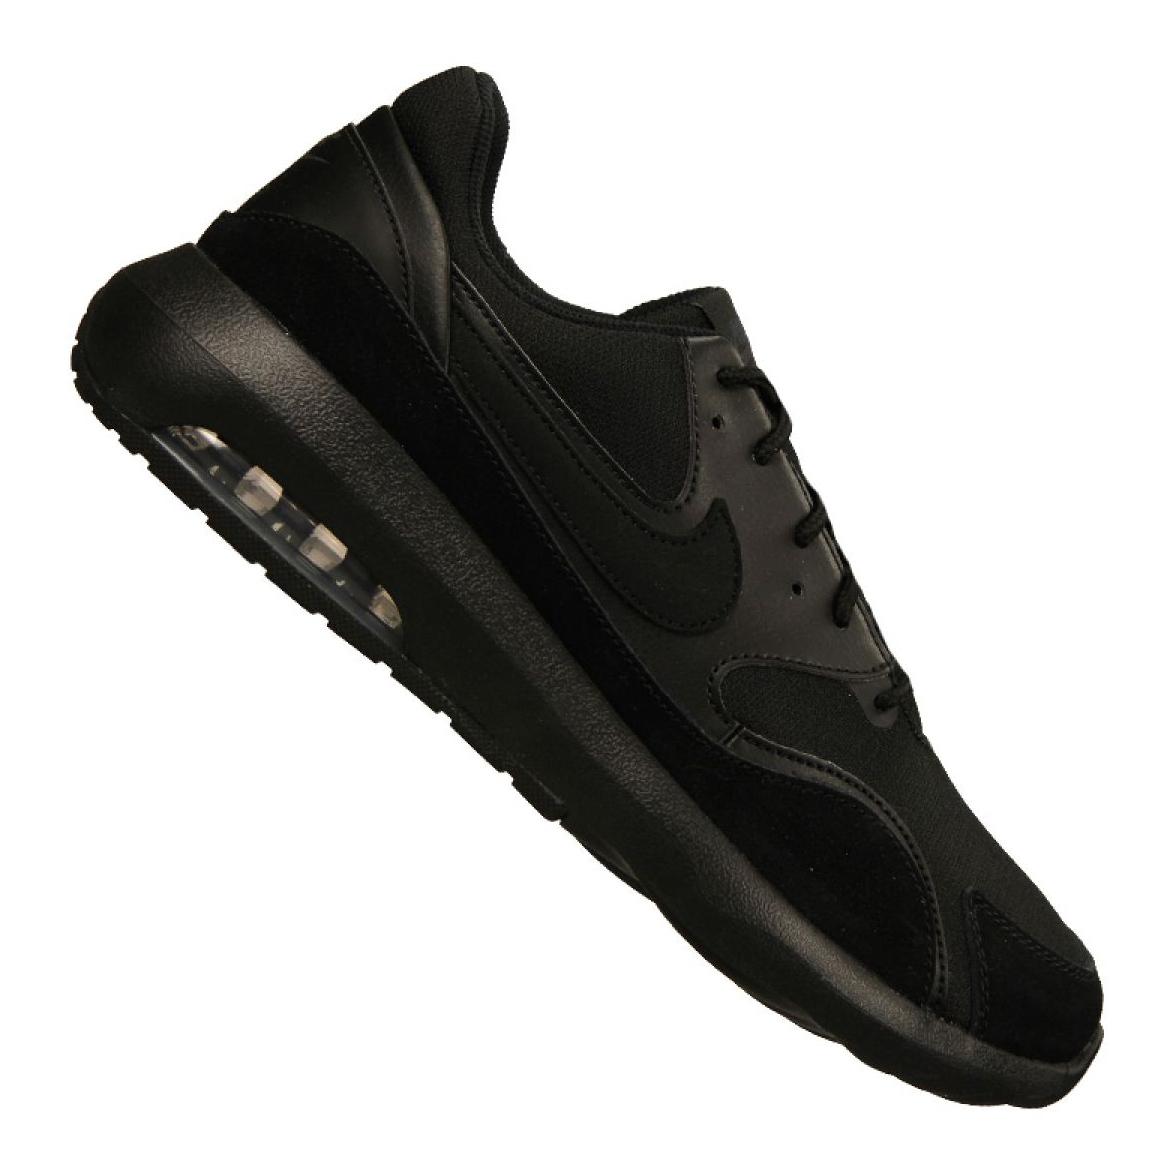 Adidas Buty Nike Air Max 270 Futura M AO1569 400 45